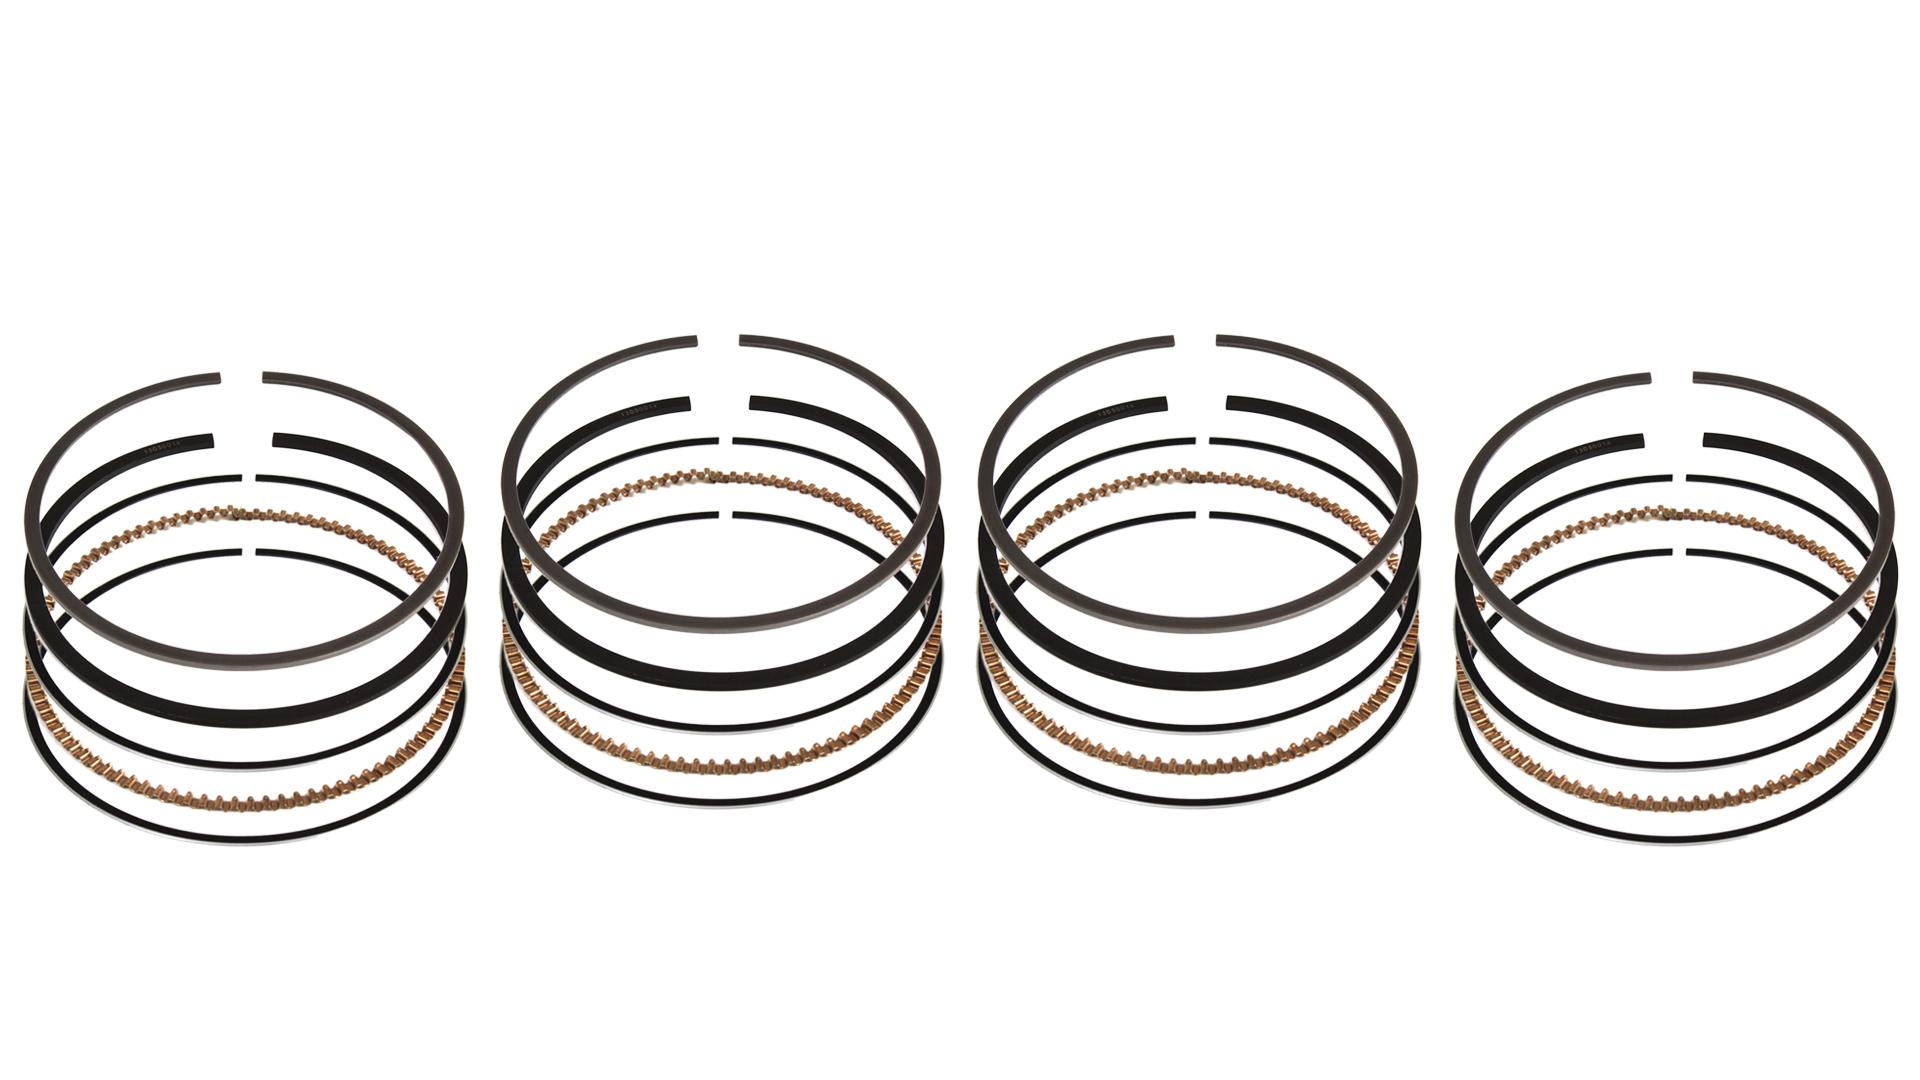 4x Segments de pistons BMW série 1 F20 F21 114 116 118 120 i 1,6 N13B16A N13 11257566479 NOUVEAU